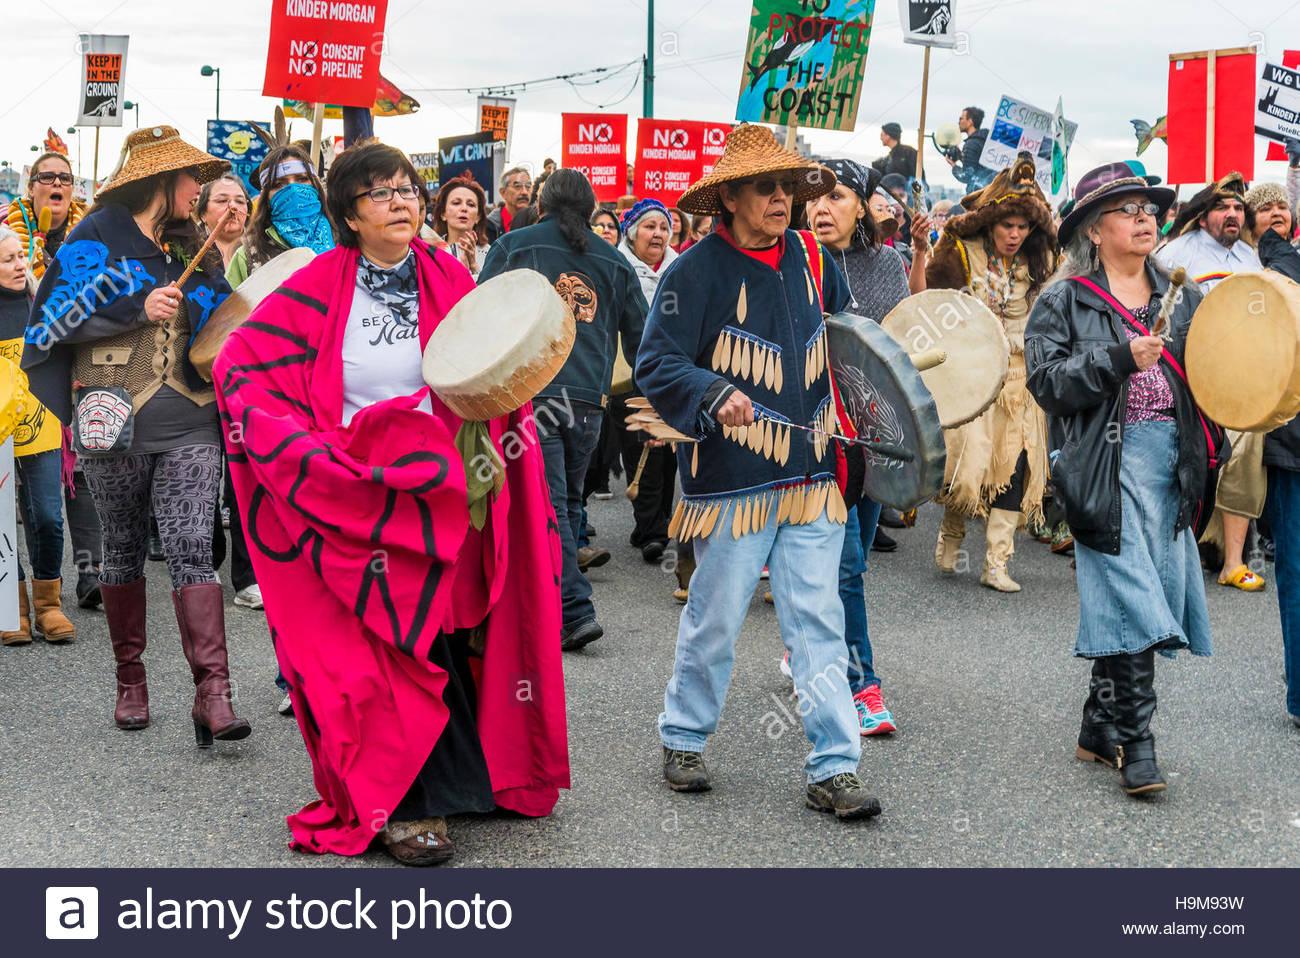 Anti-Kinder Morgan Pipeline Protestkundgebung und März, Vancouver, Britisch-Kolumbien, Kanada. Stockbild